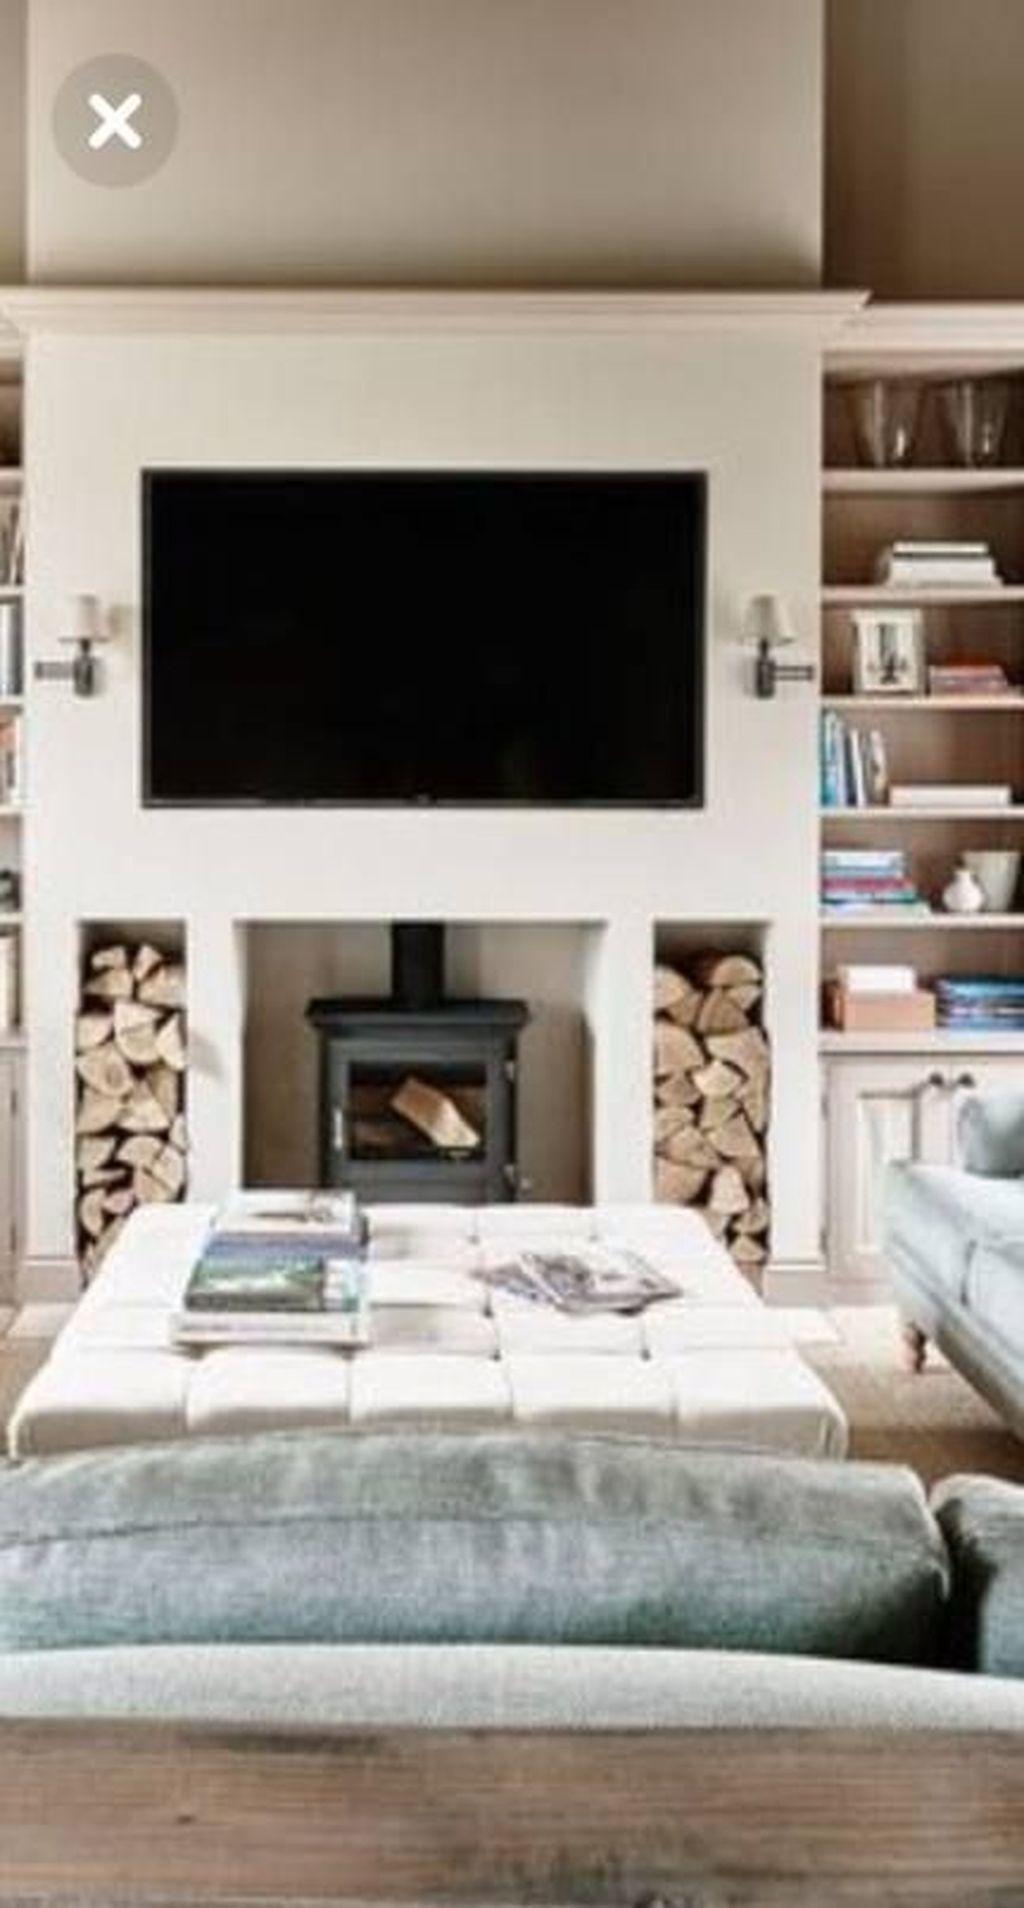 33 Stunning Modern Fireplace Design Ideas With Tv Above Log